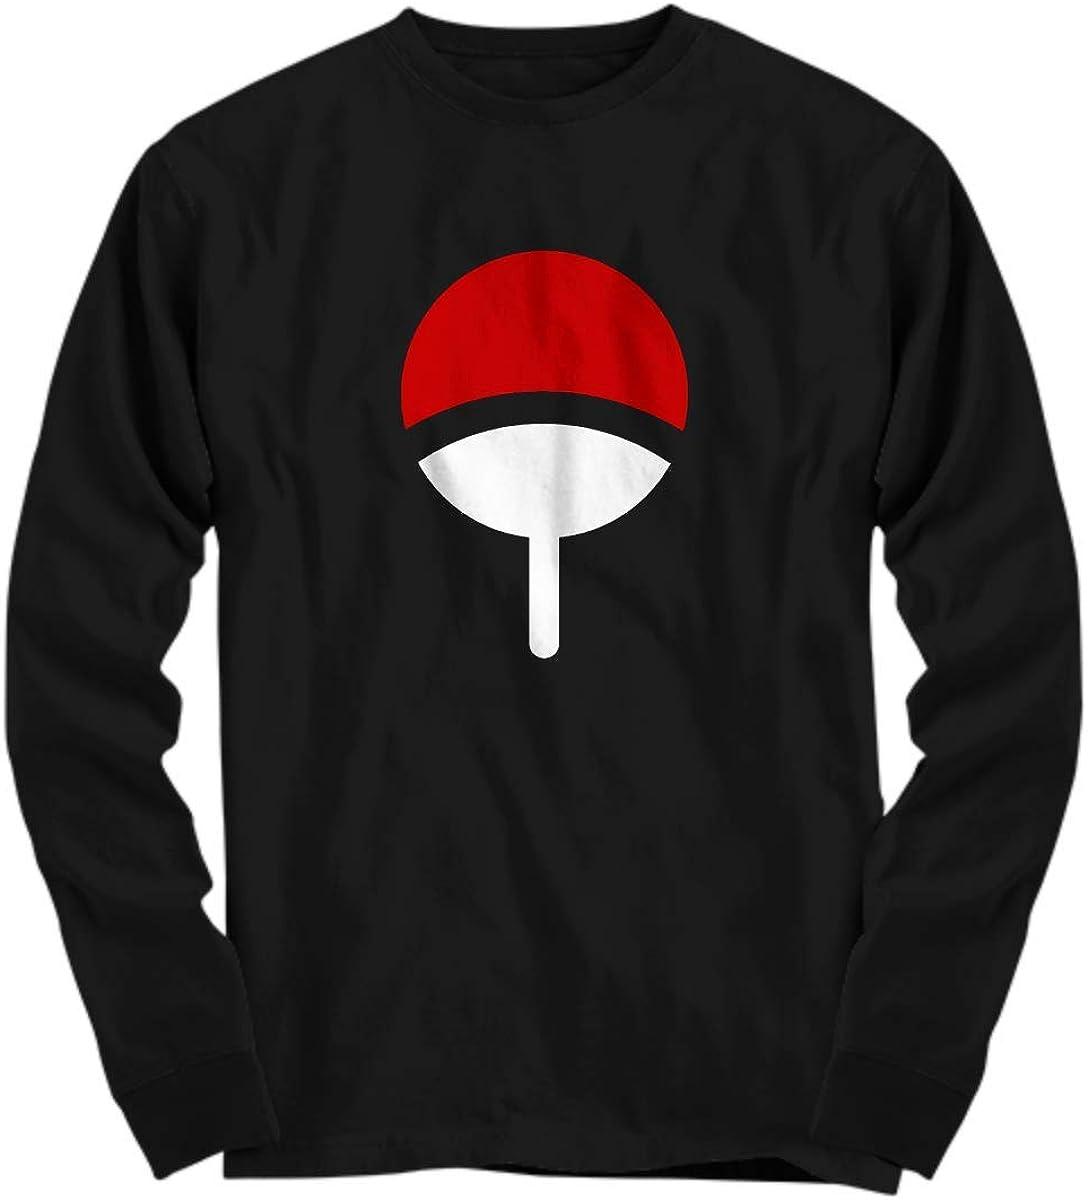 Weimisi Naruto Anime Seal T-Shirt